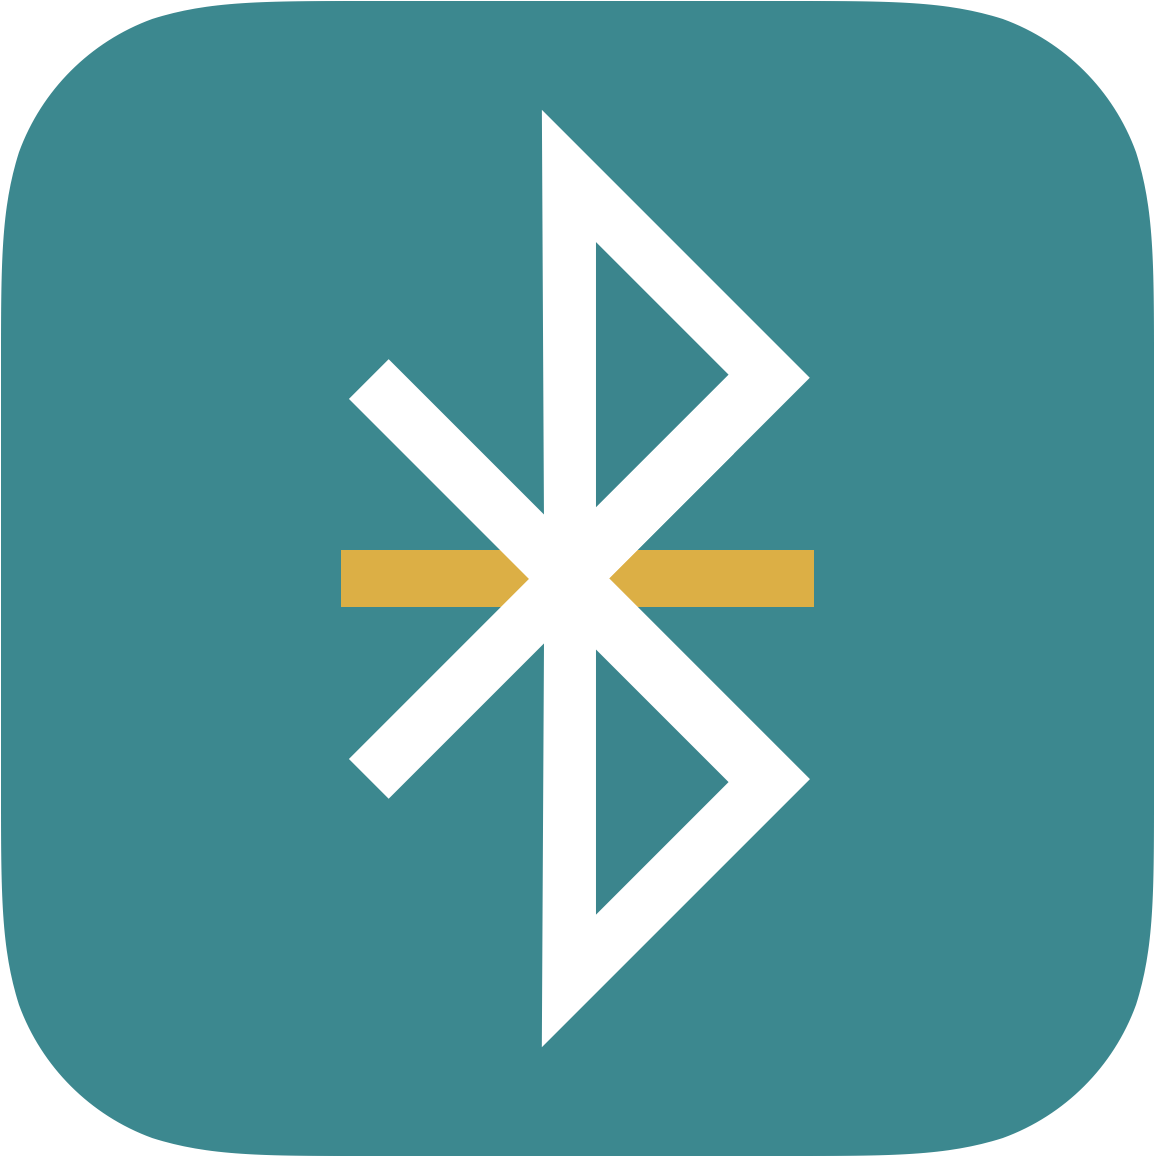 BLExAR App for IoT Integration